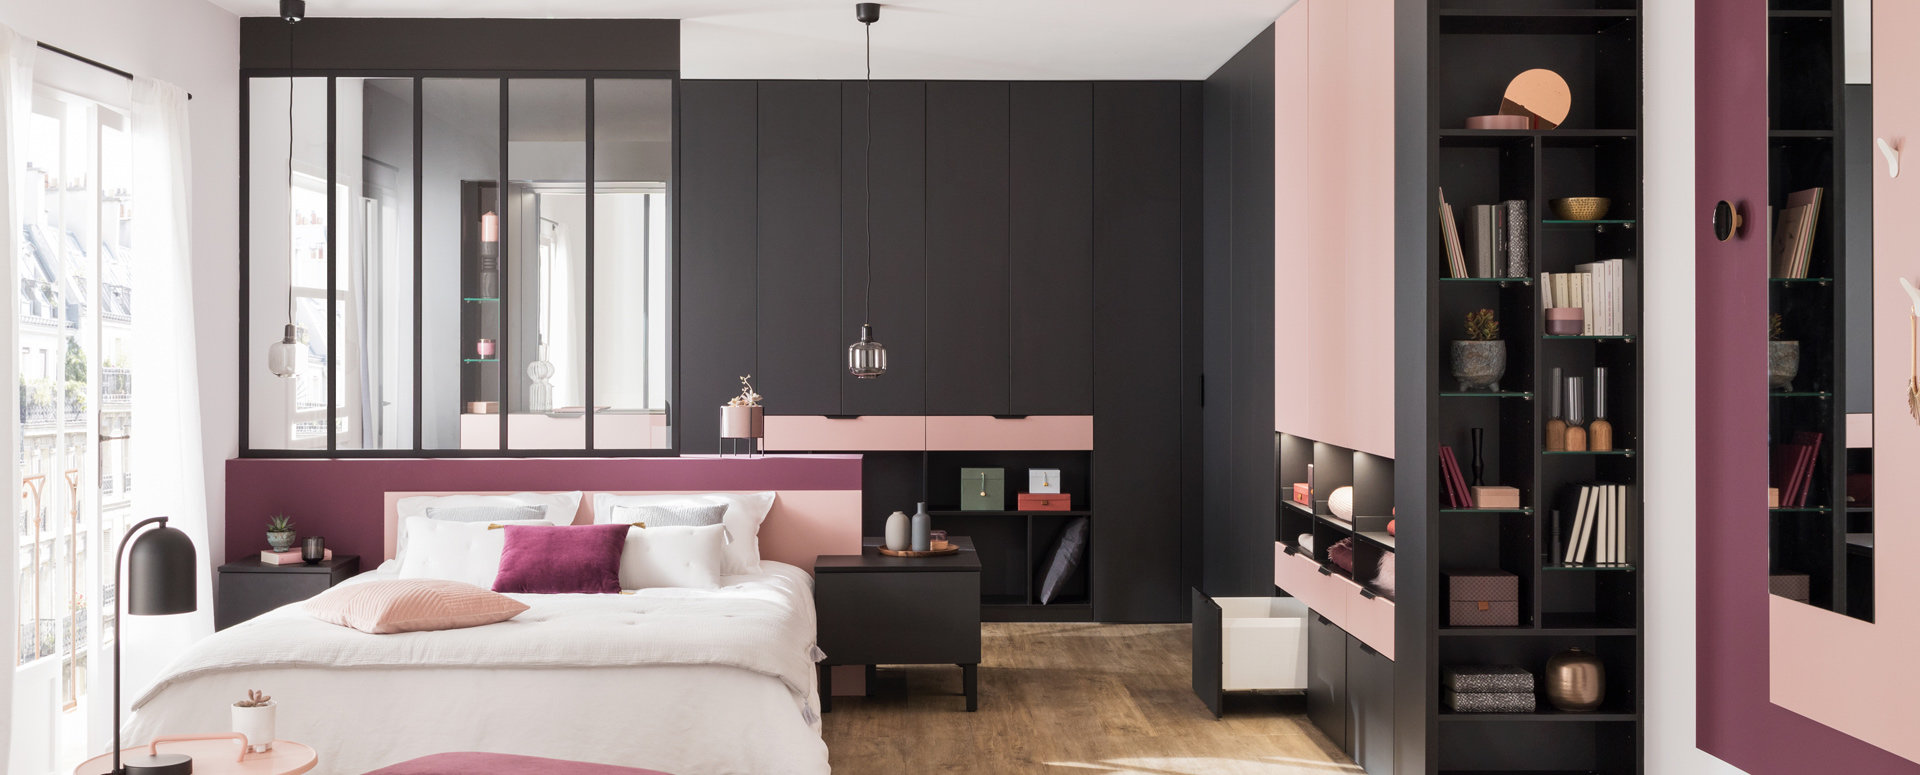 Bilde Soverom med garderobe sort og rosa matt melamin med skreddersydde mål perspektiv